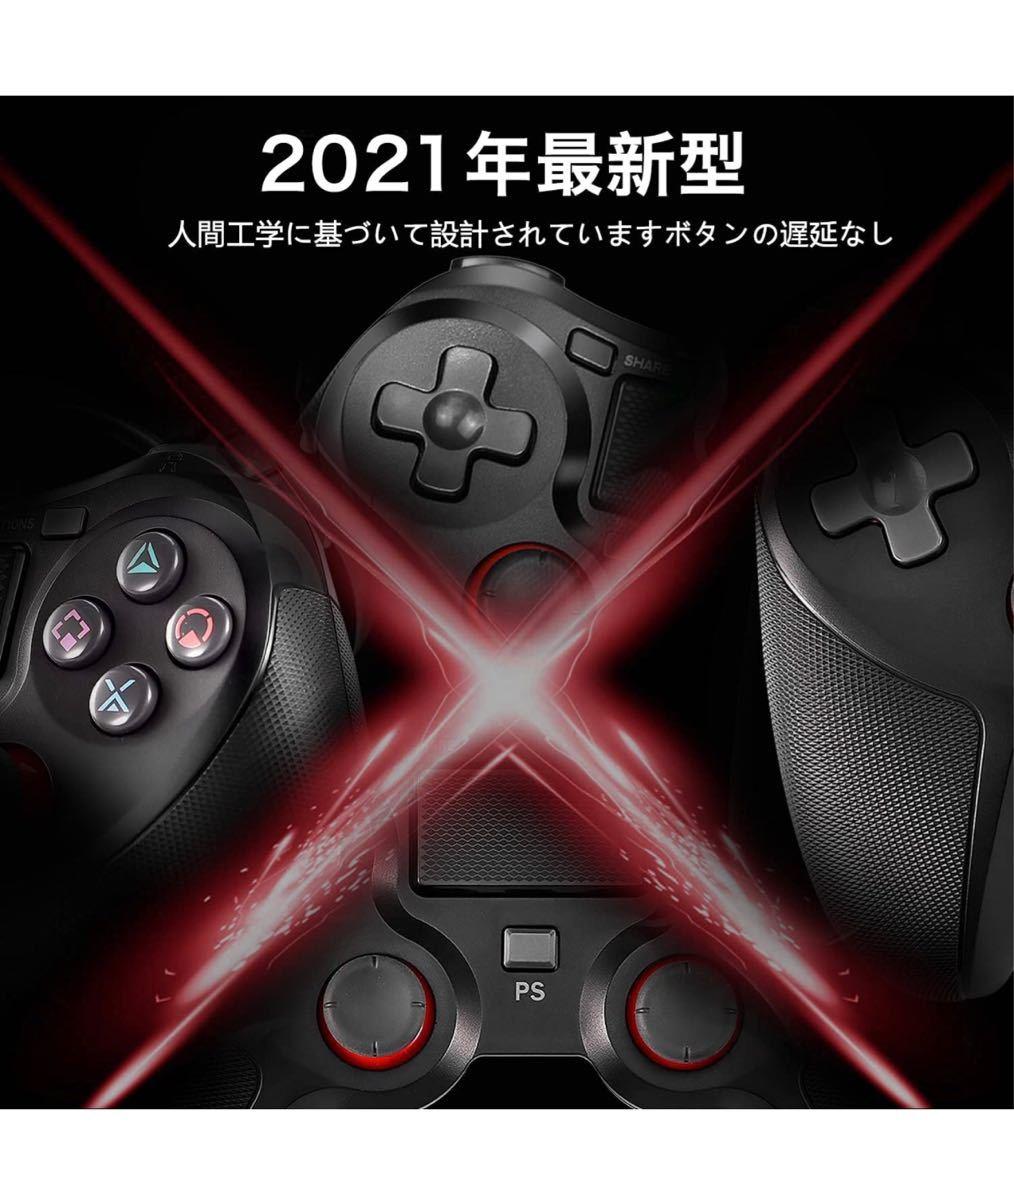 PS4 コントローラー PC コントローラー PS4 Pro/Slim PS3 Win7/8/10 対応 有線 ゲームパッド